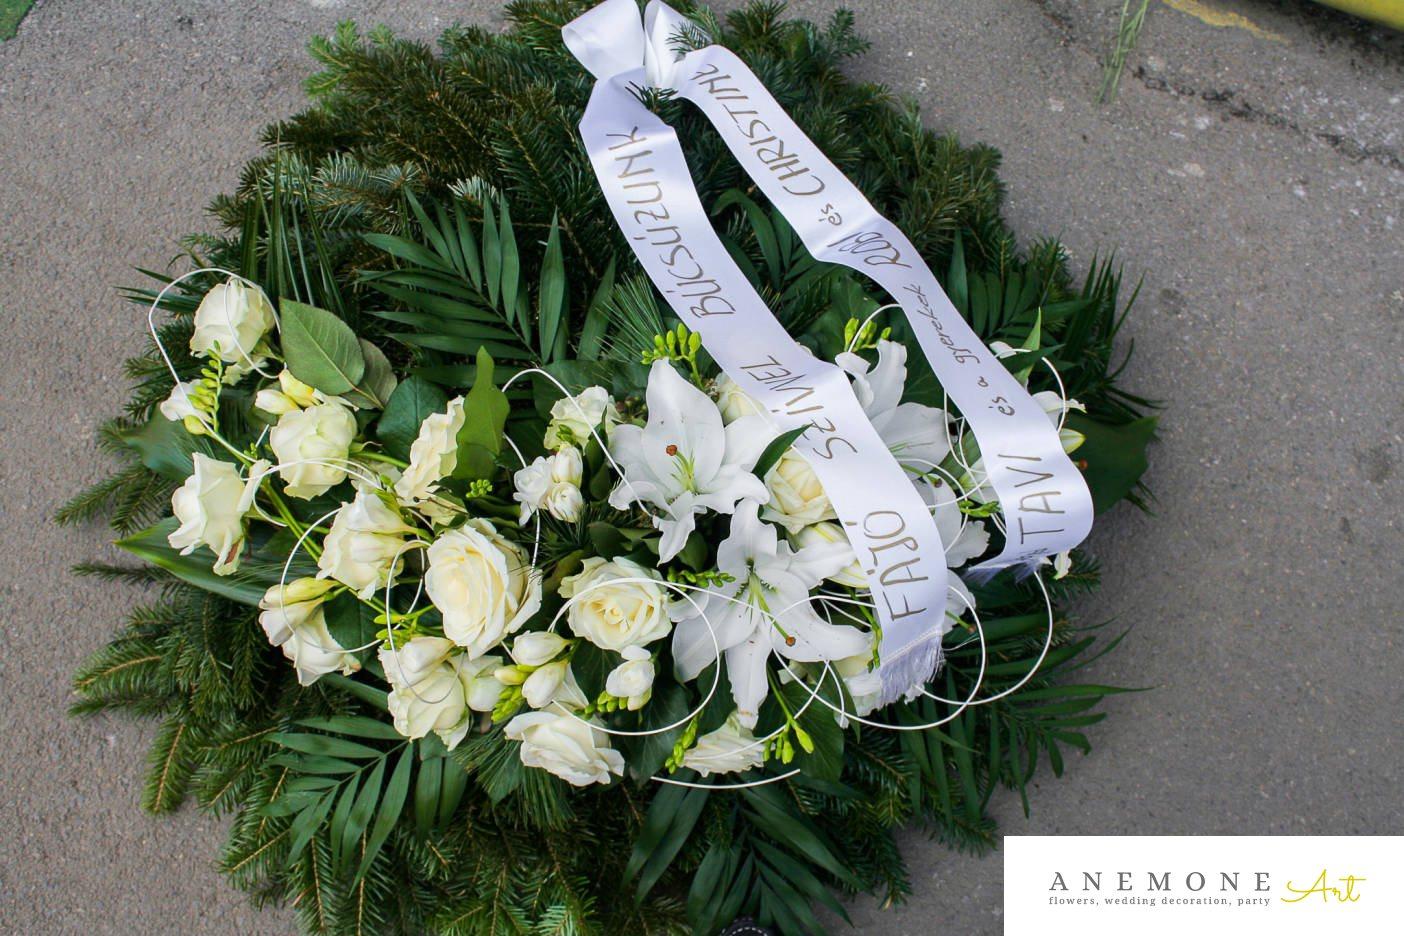 Poza, foto cu Flori de nunta alb, coroana funerara, crem, crin, trandafiri in Arad, Timisoara, Oradea (wedding flowers, bouquets) nunta Arad, Timisoara, Oradea